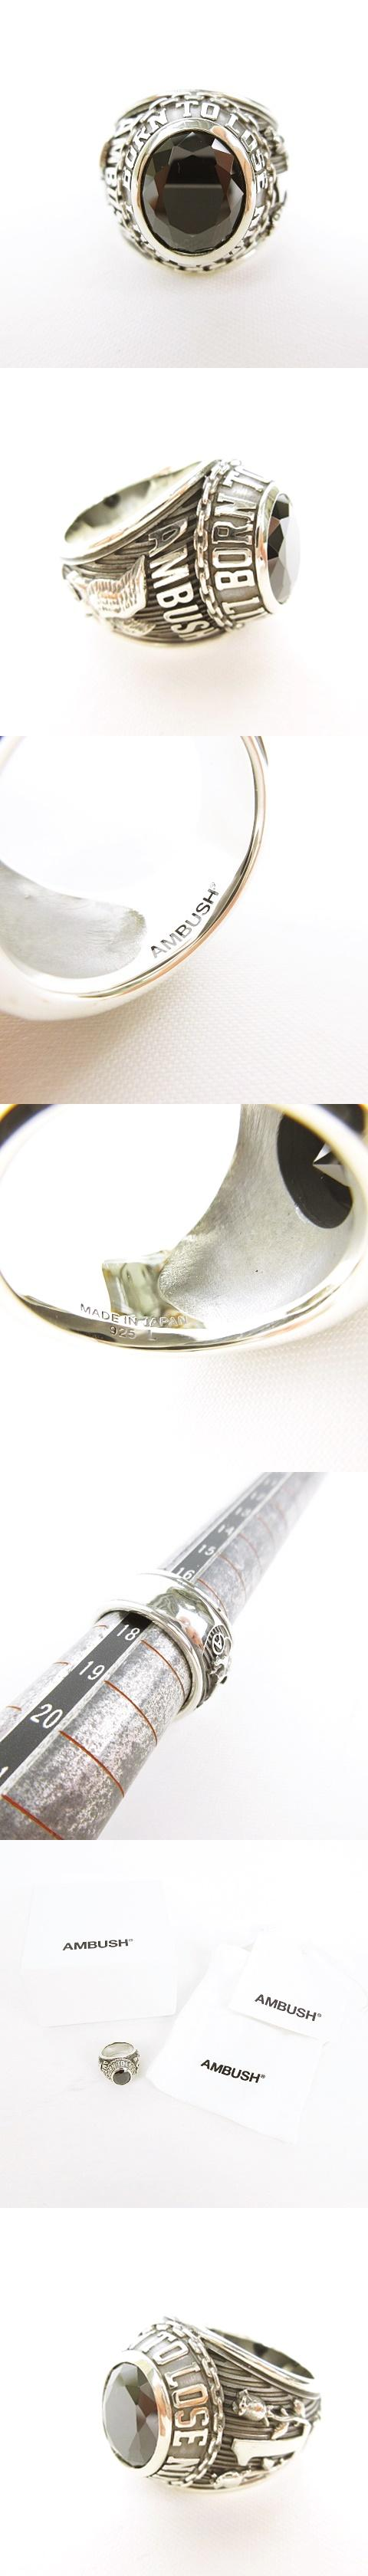 CLASS RING Silver - Black L COLLEGE RING クラスリング カレッジリング 指輪 ストーン付き アクセサリー オニキス × シルバー SILVER 925 未使用 美品